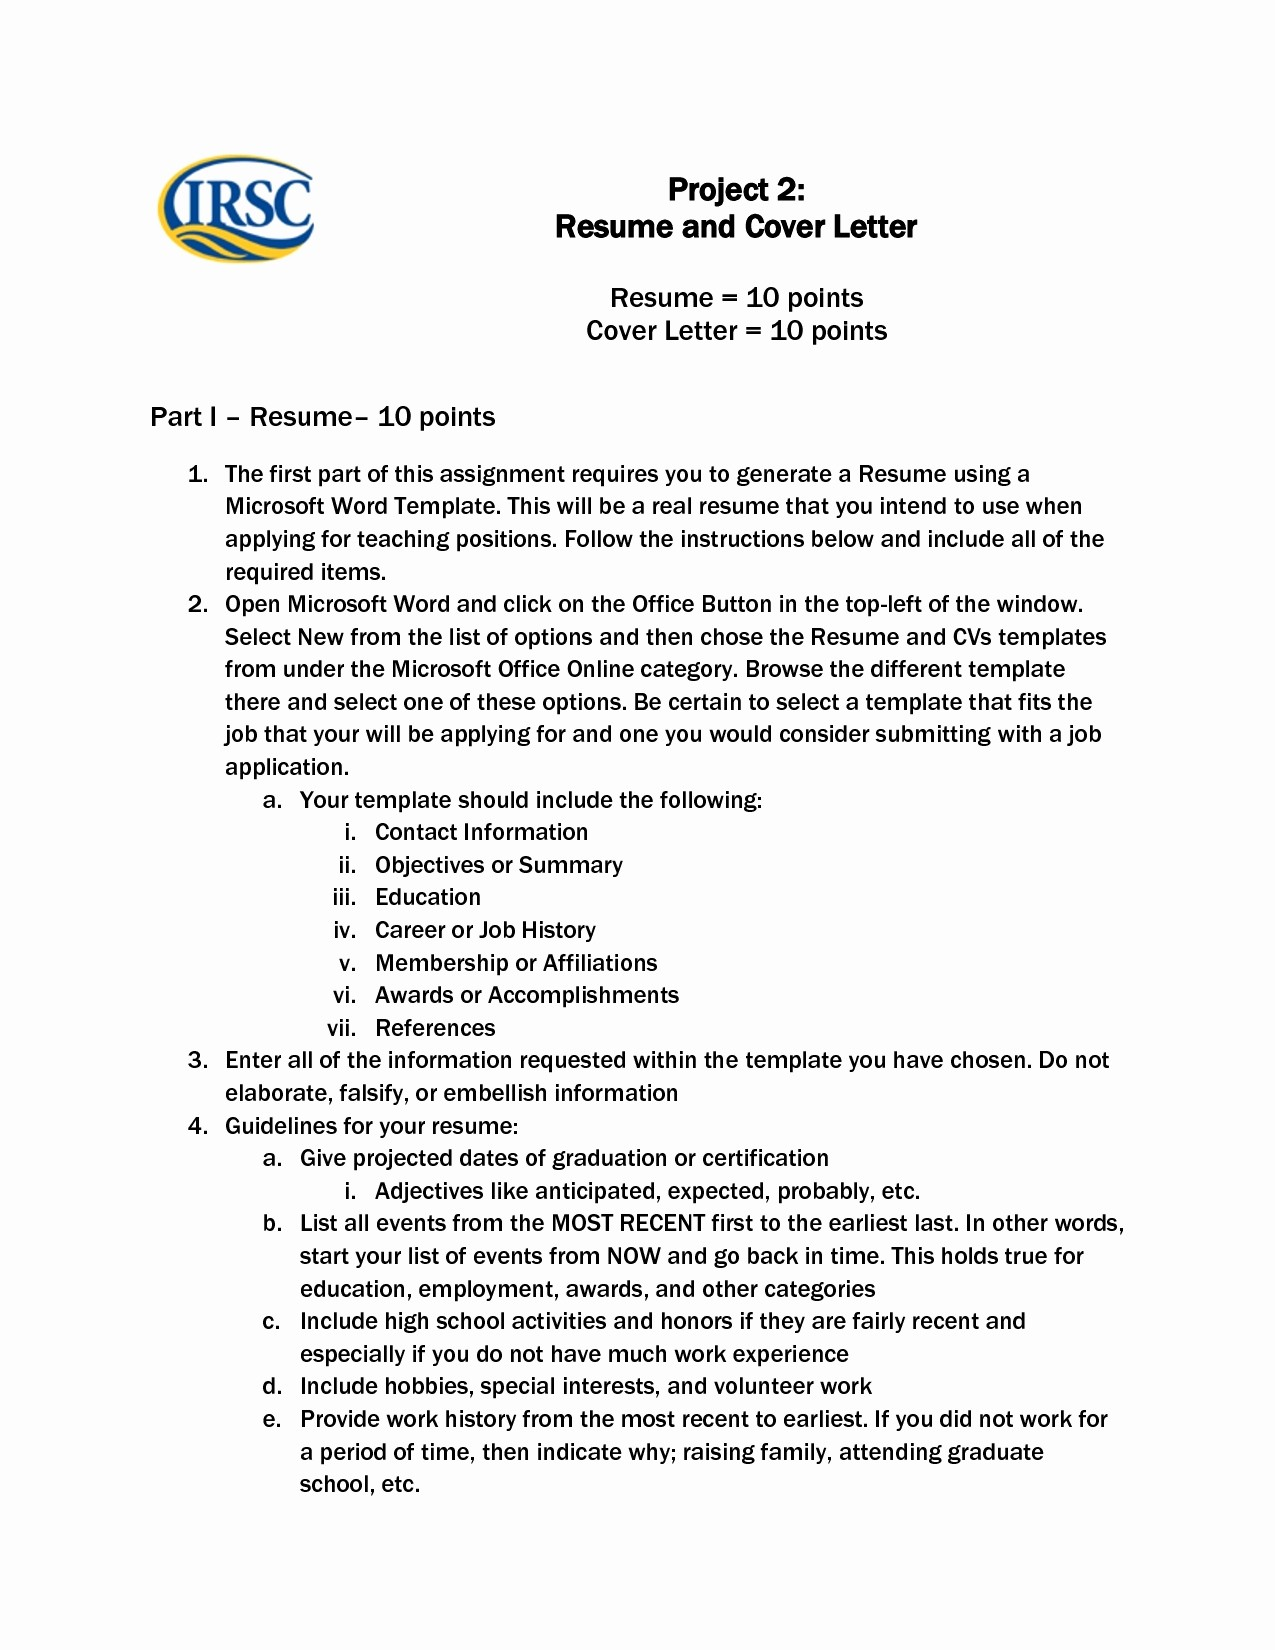 Resume Cover Letter Templates Free Elegant Resume Cover Letter Template 2017